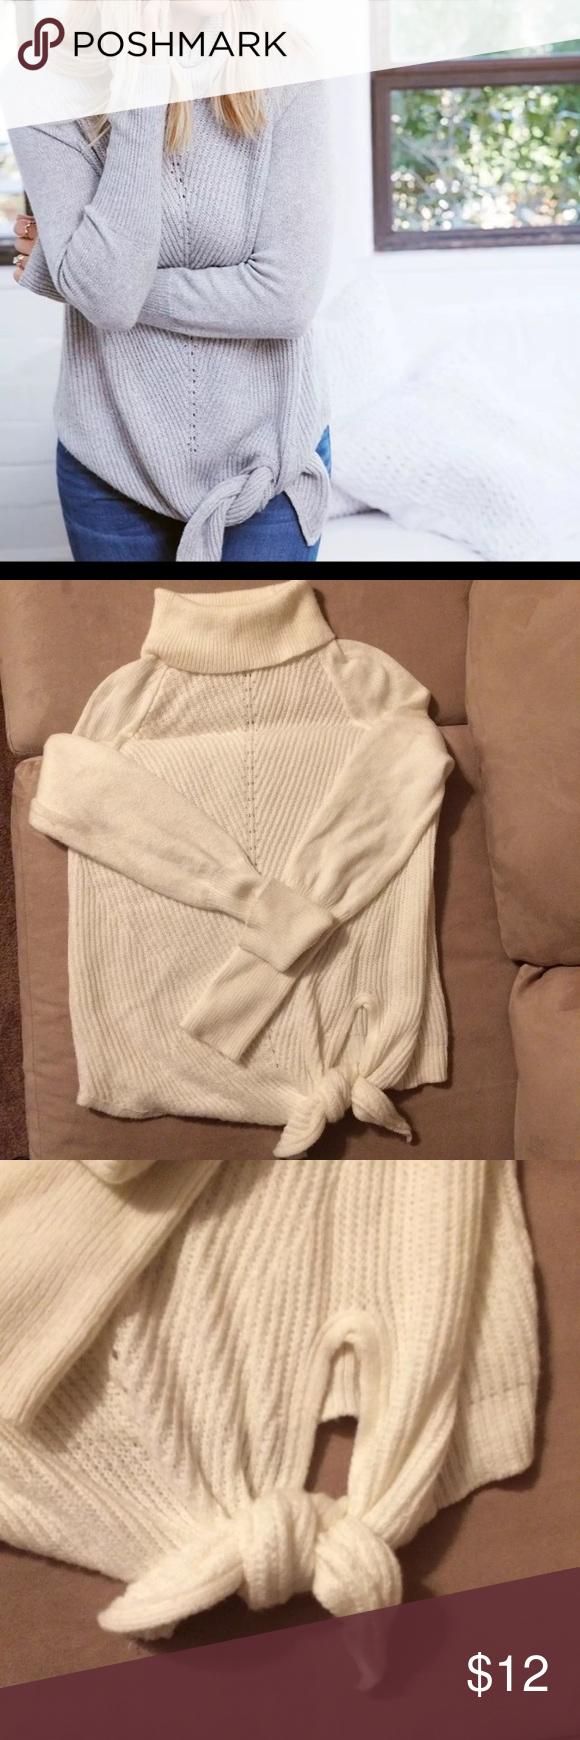 Lauren Conrad sweater White/cream turtle neck sweater with tie detail at the bottom . Was purchased but never used. LC Lauren Conrad Sweaters Cowl & Turtlenecks